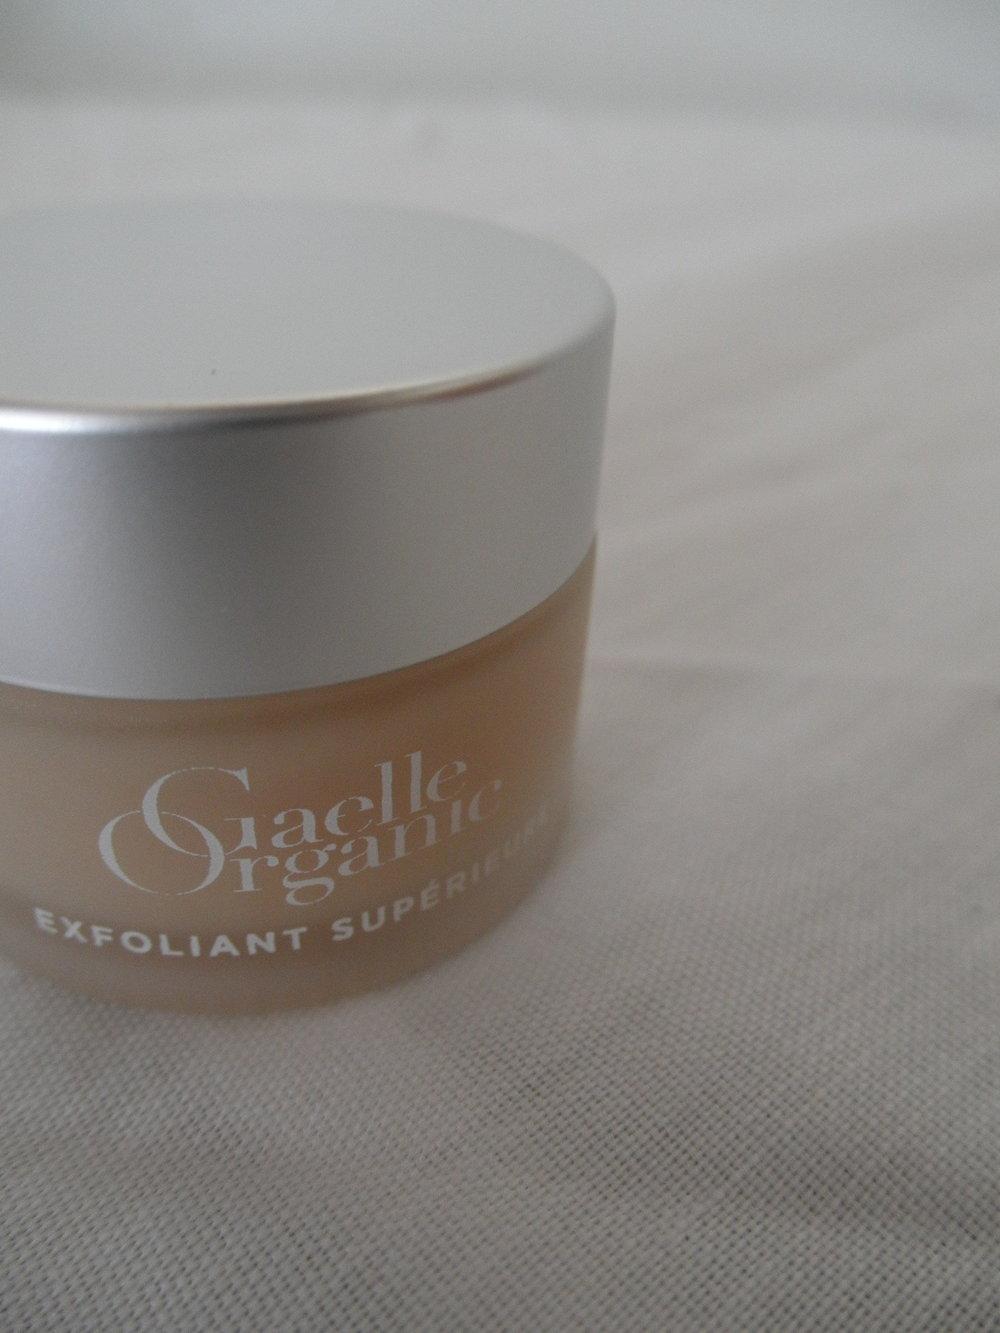 Gaelle Organic - Exfoliant Supérieure -